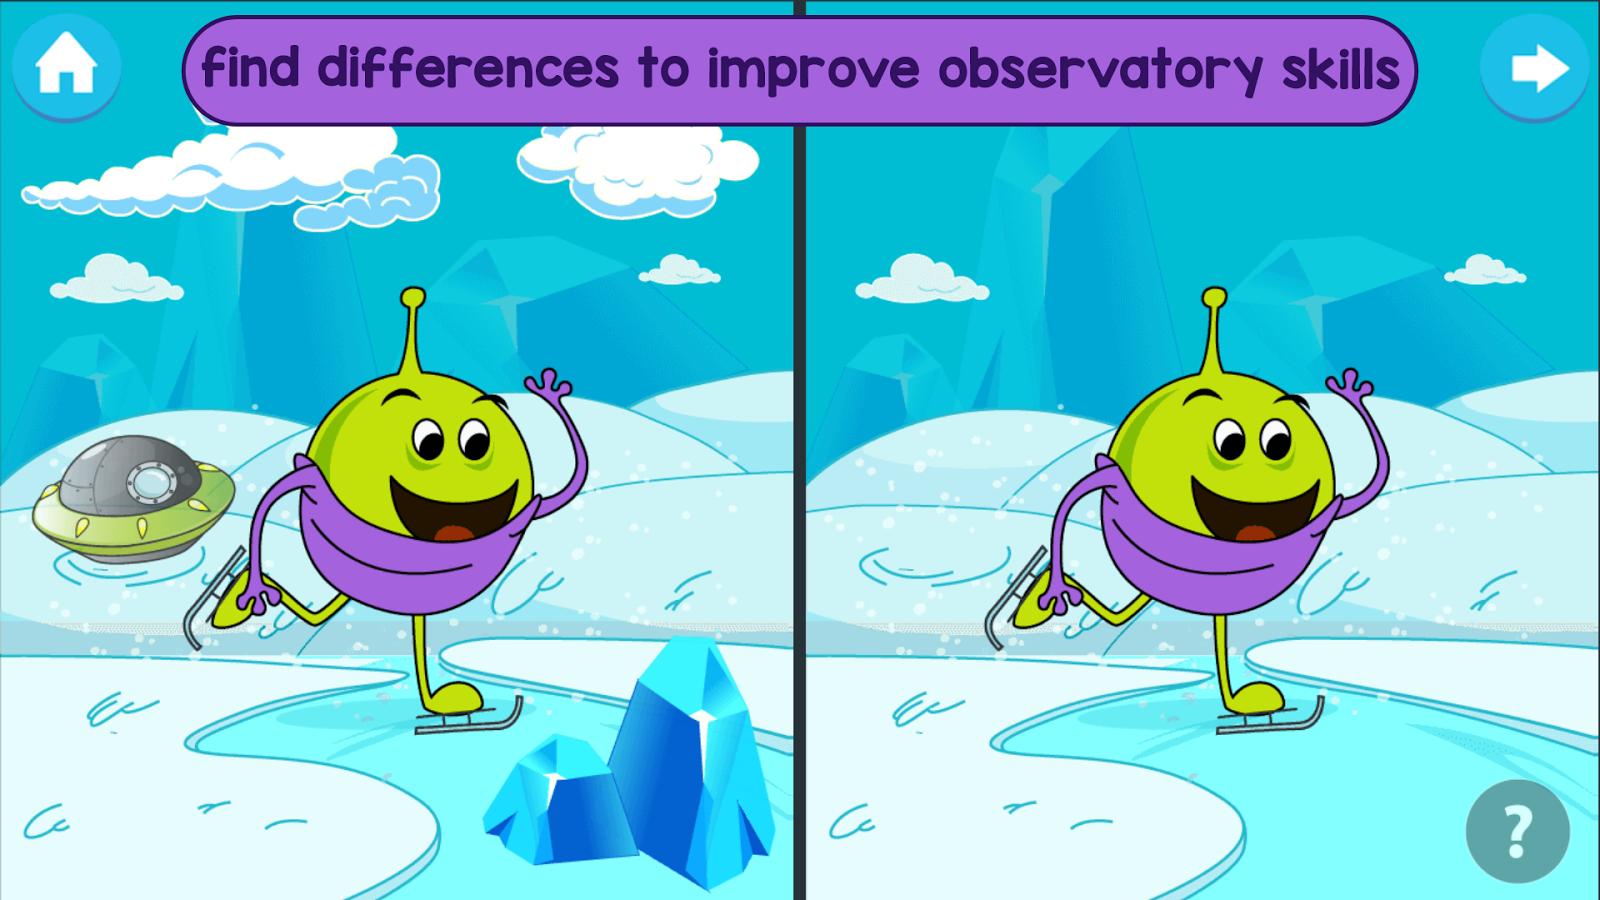 Preschool Learning Games : Fun Games for Kids 6.0.4.8 APK Download ...